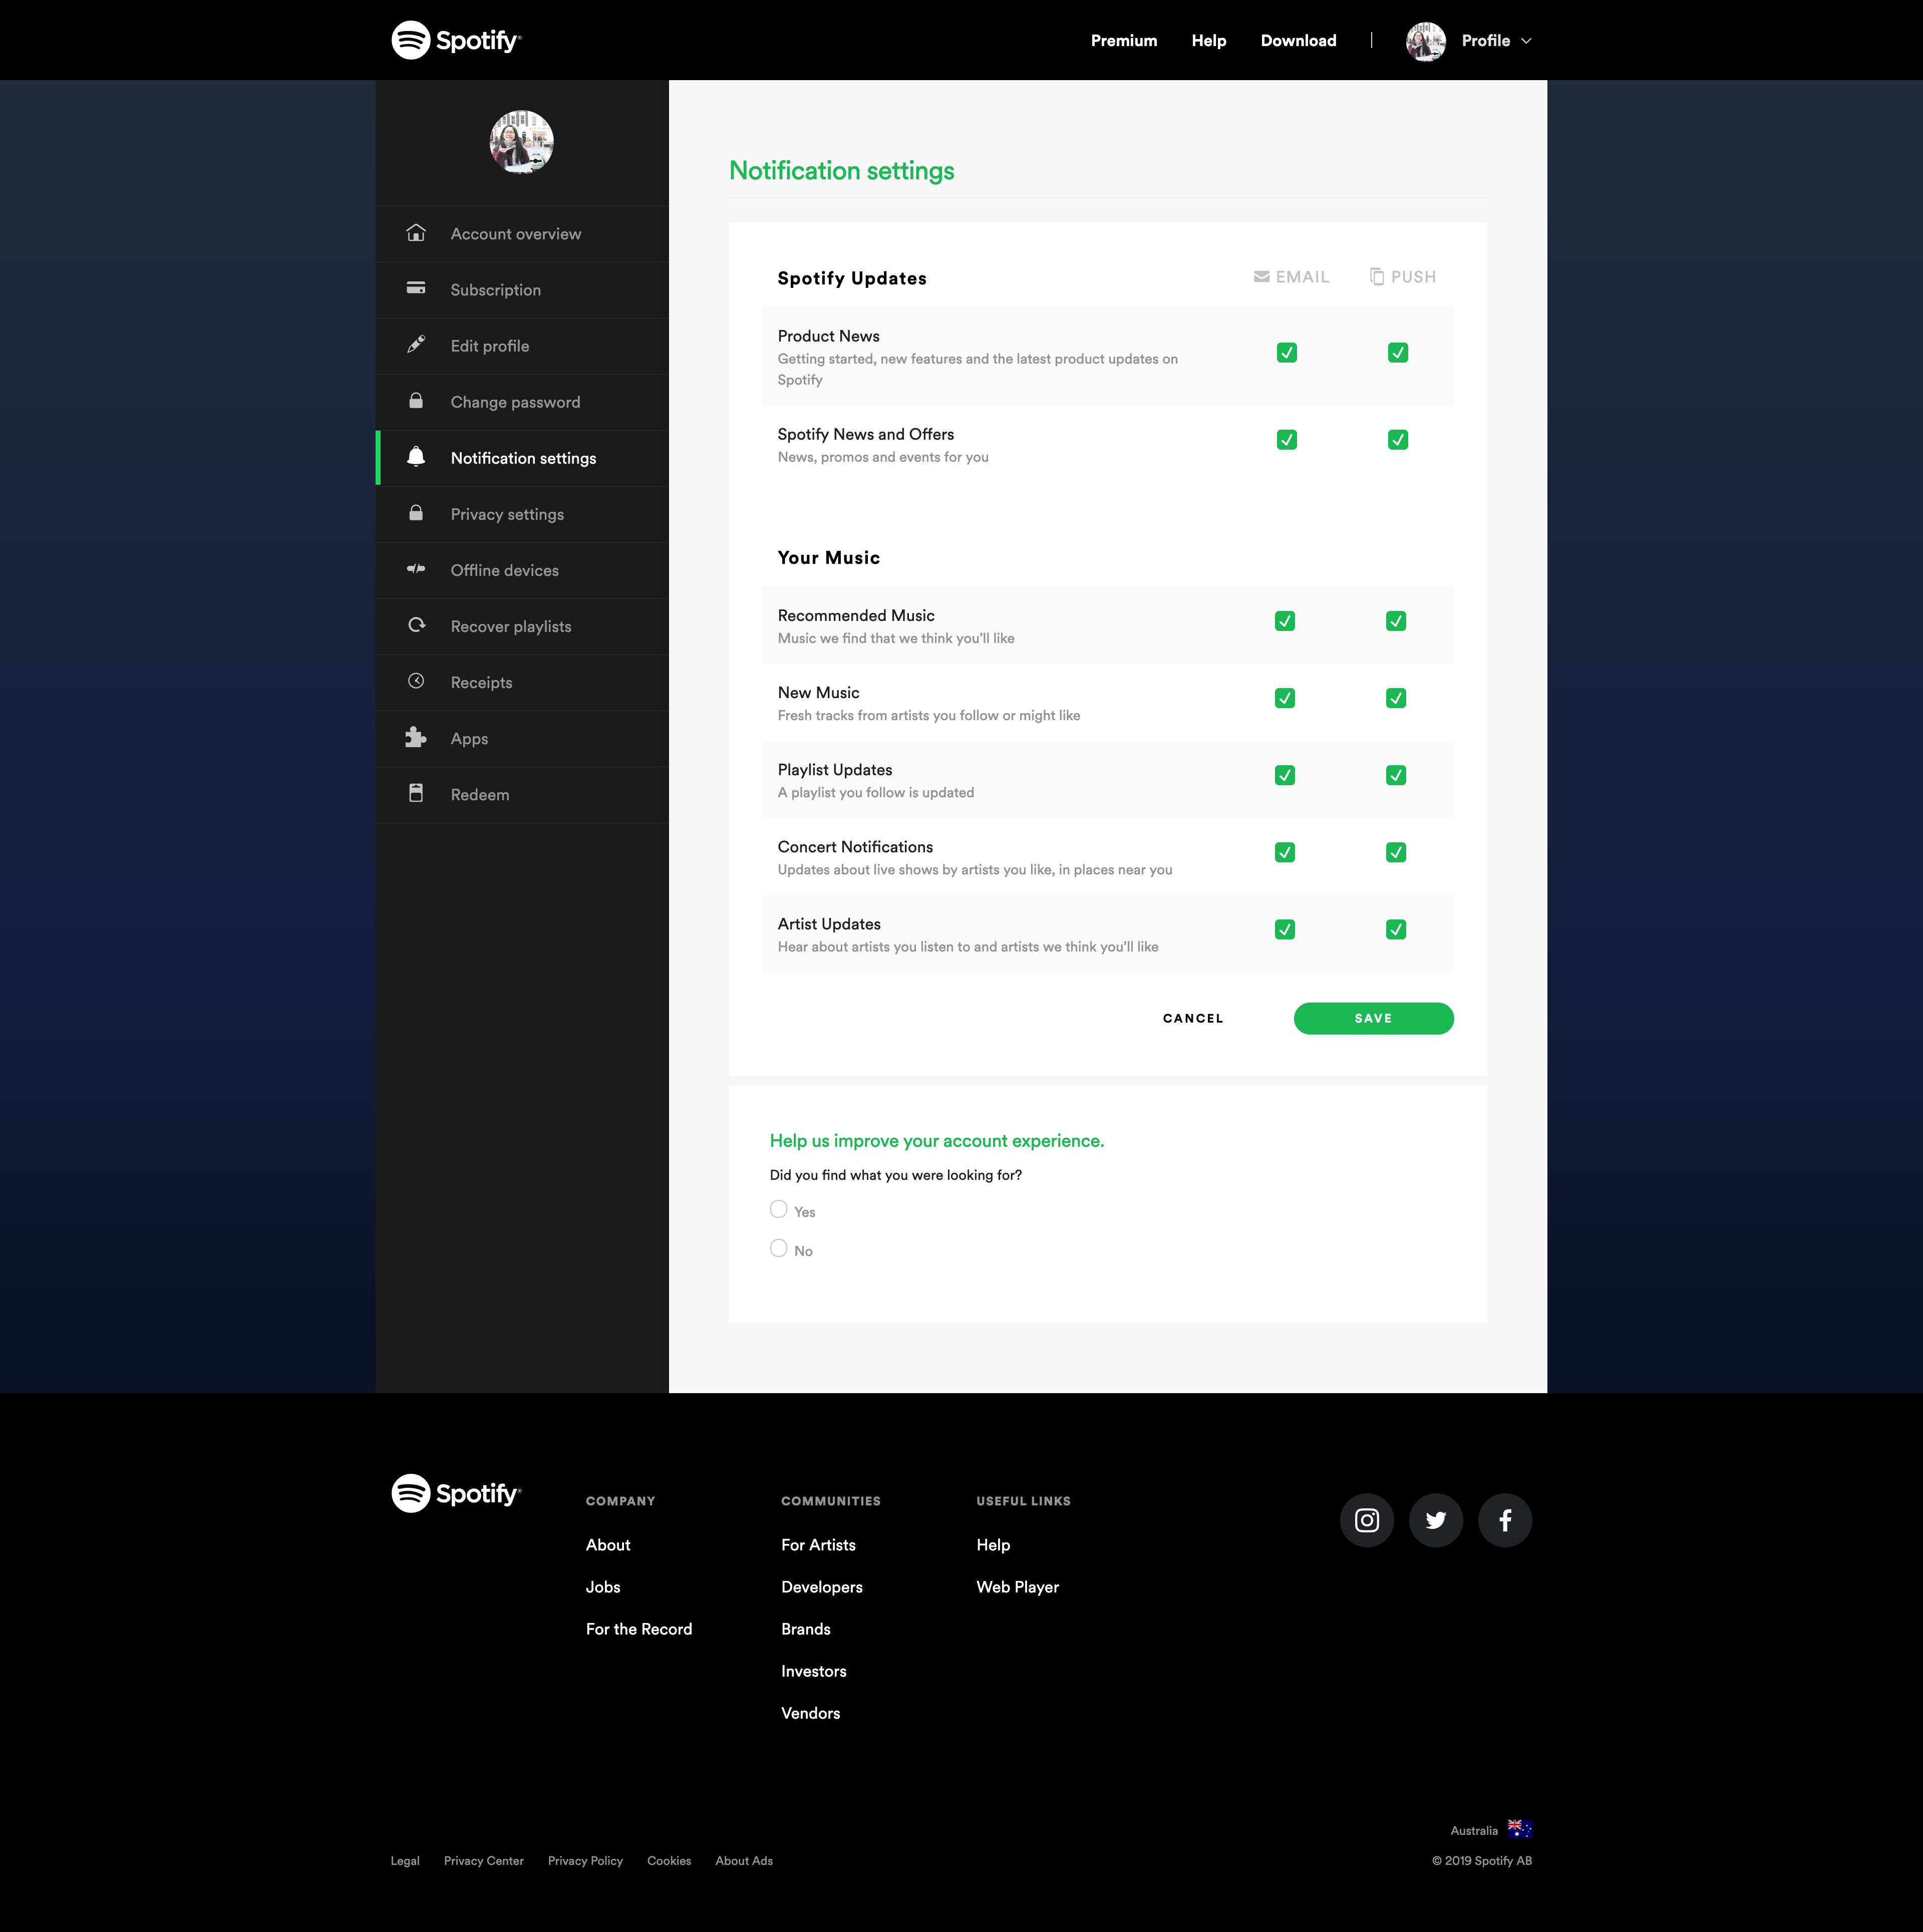 Notification Settings by Spotify